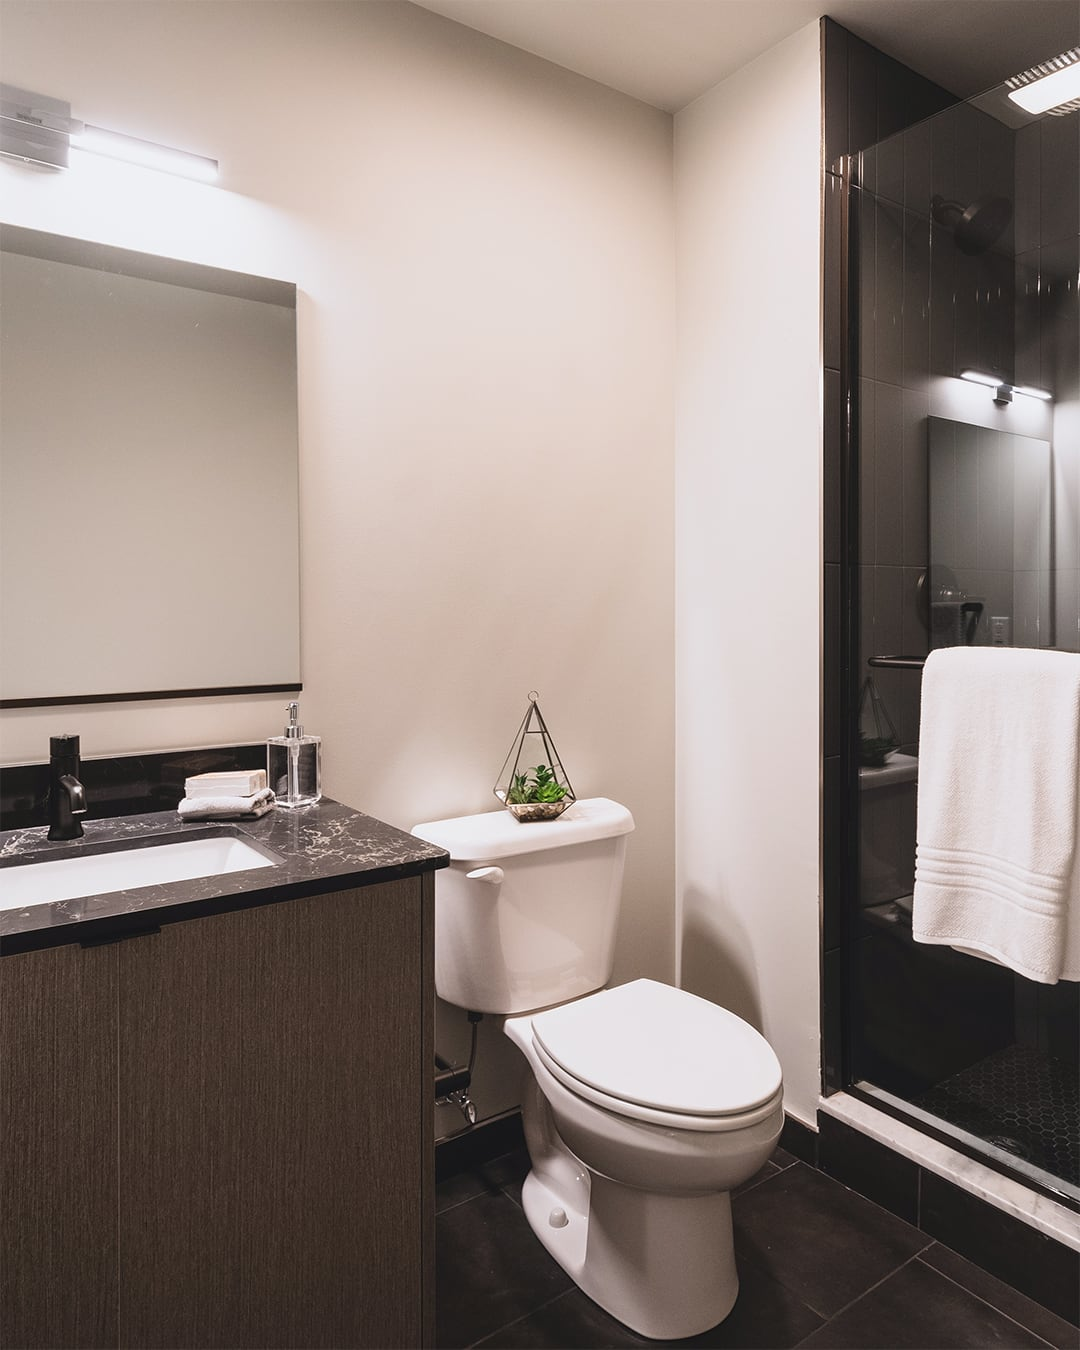 350 Sq Ft Studio Apartment: Apartments - Studio, One & Two Bedroom